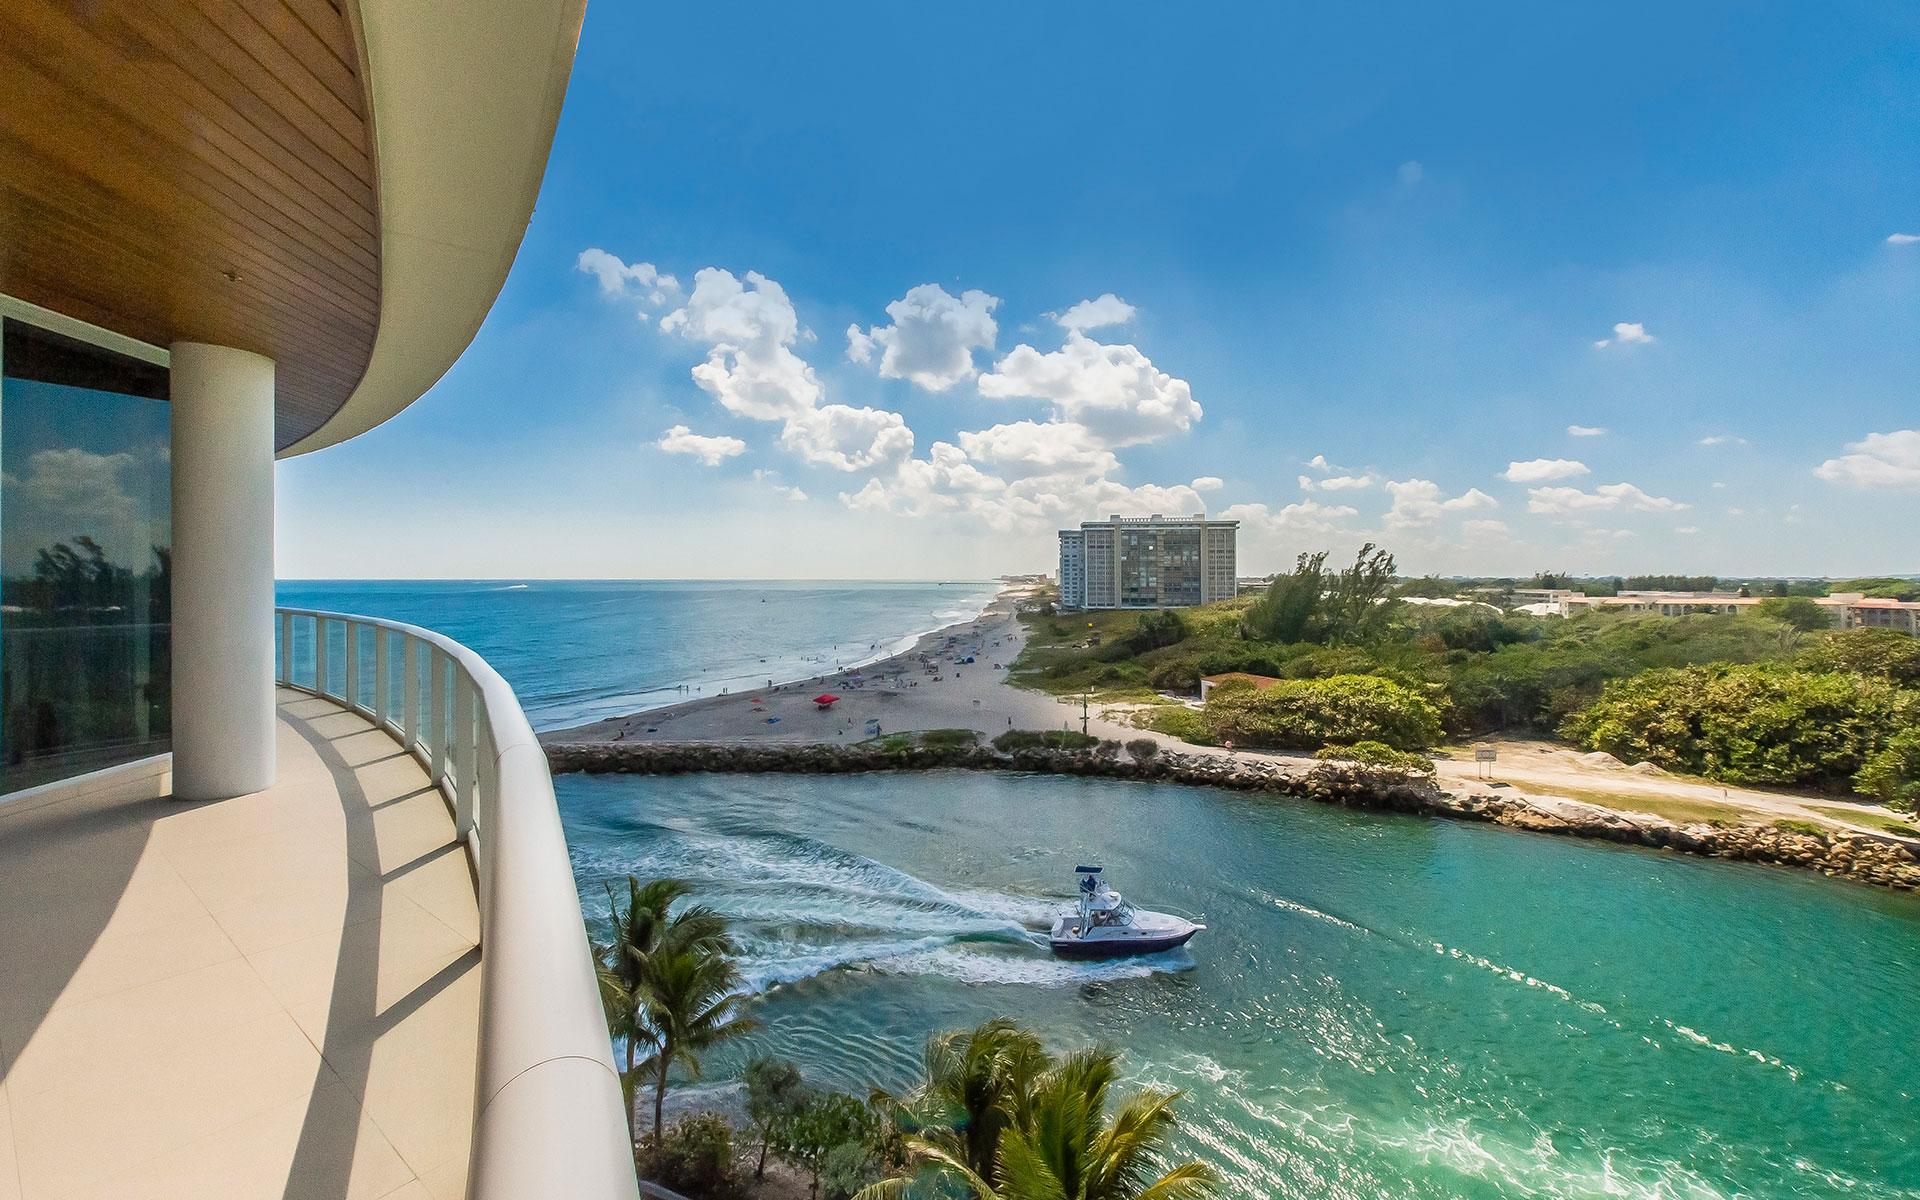 Ocean views from a balcony in Boca